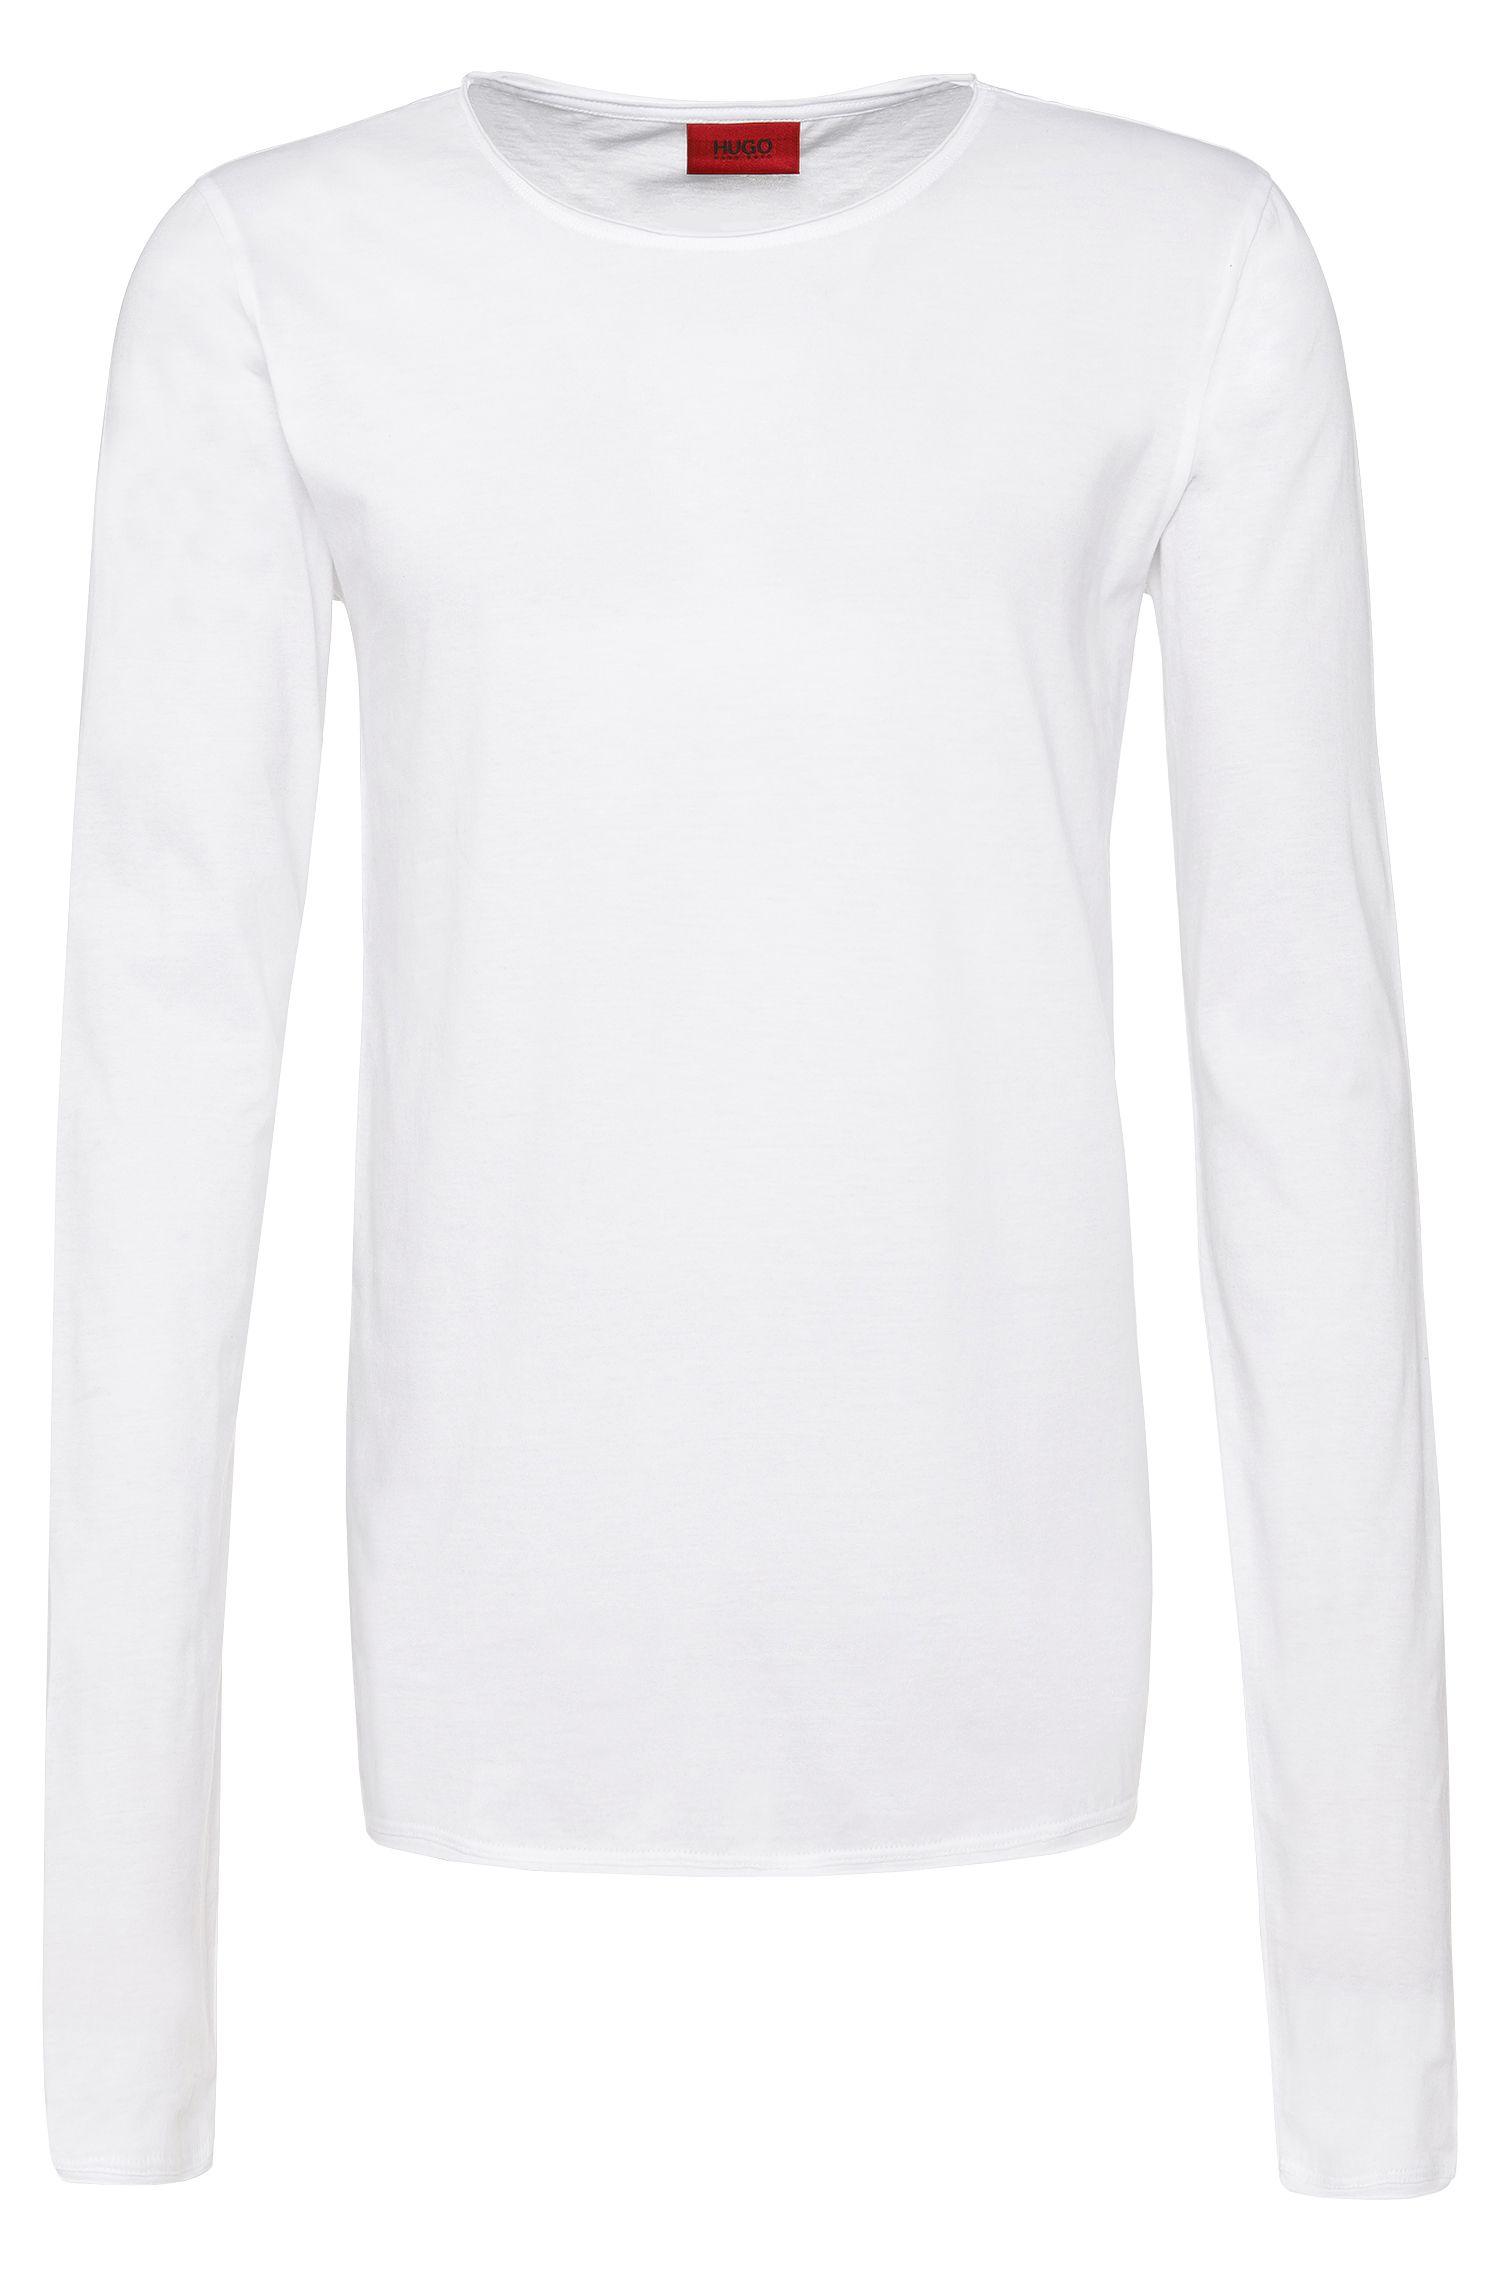 Maglietta a maniche lunghe relaxed fit in cotone: 'Doops'